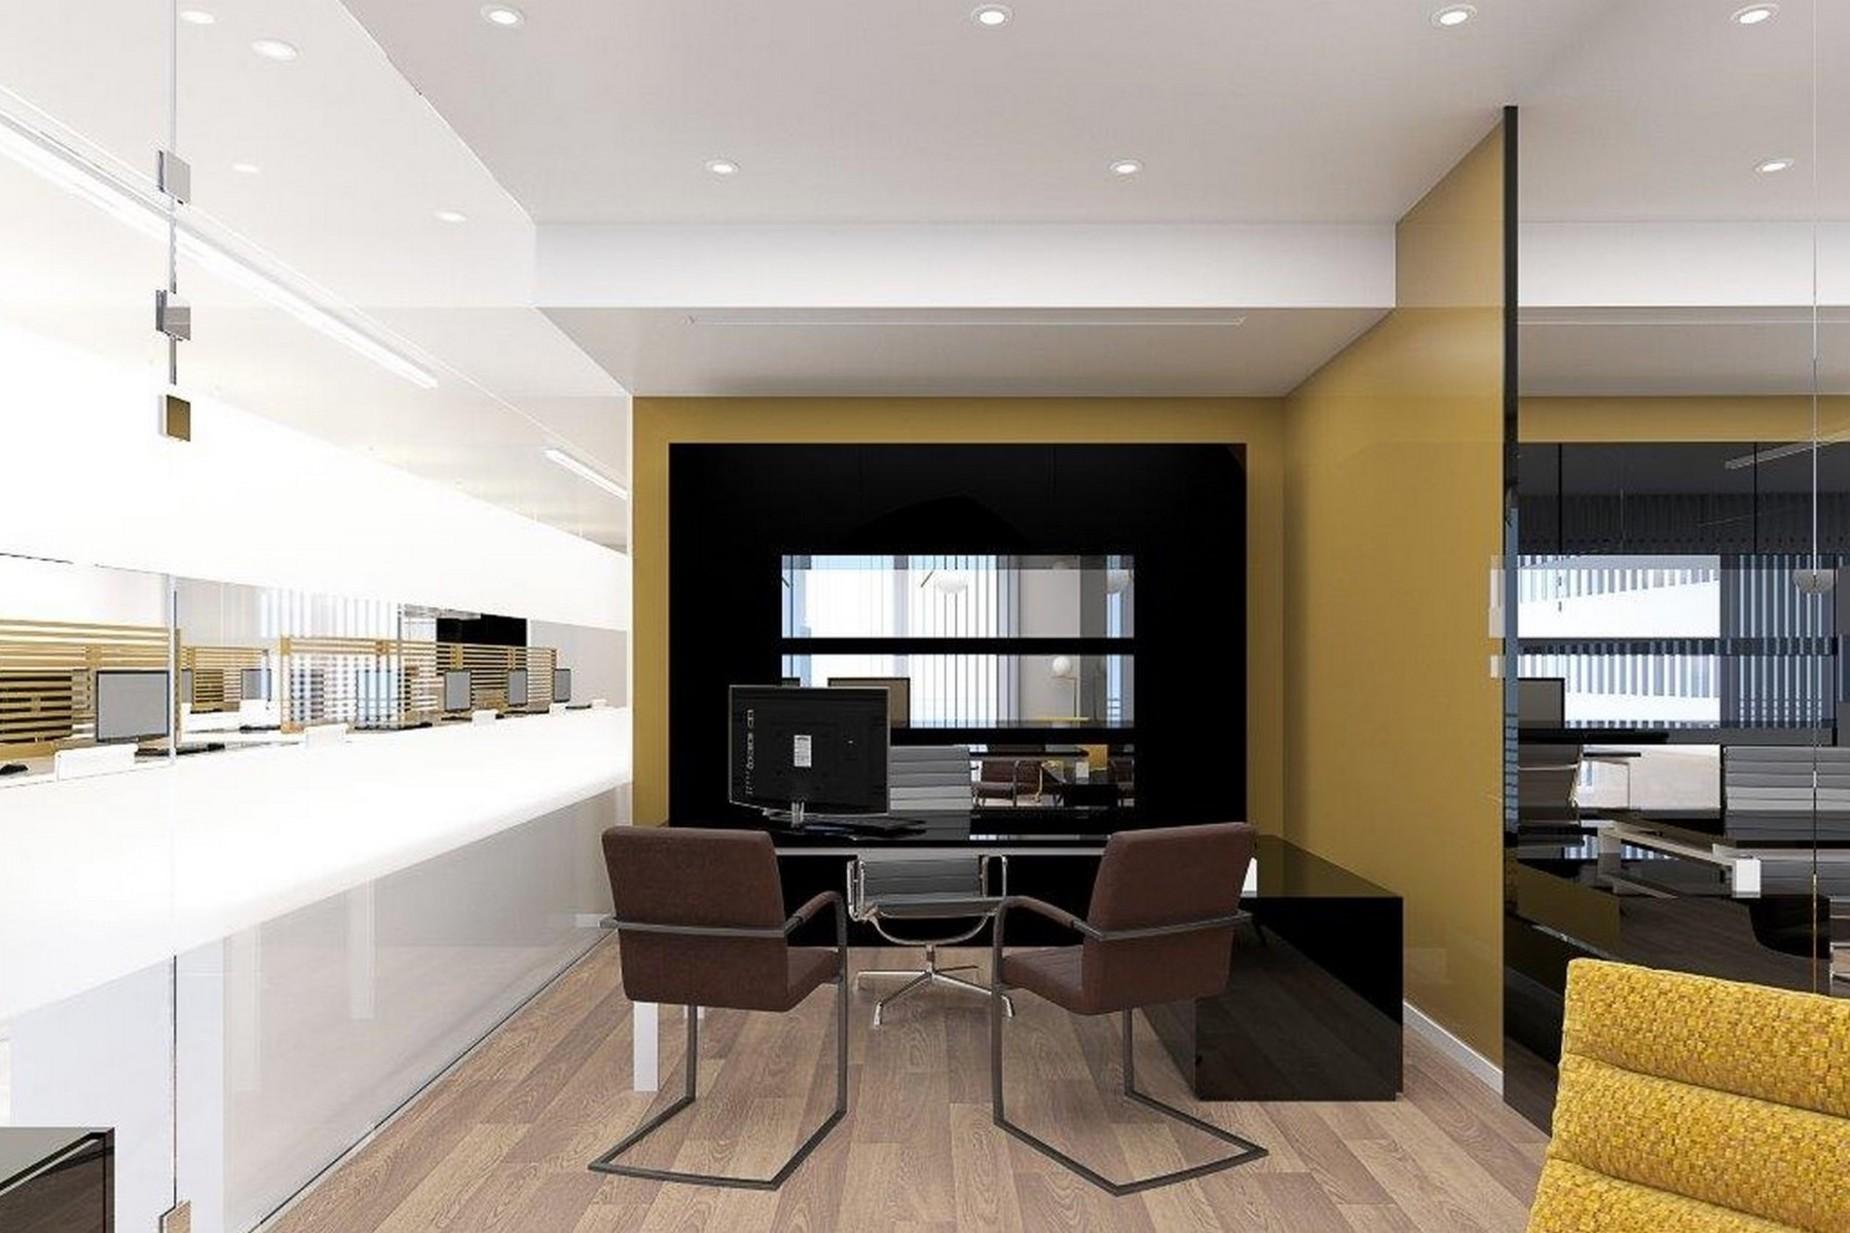 0 bed Office For Rent in Pieta, Pieta - thumb 9